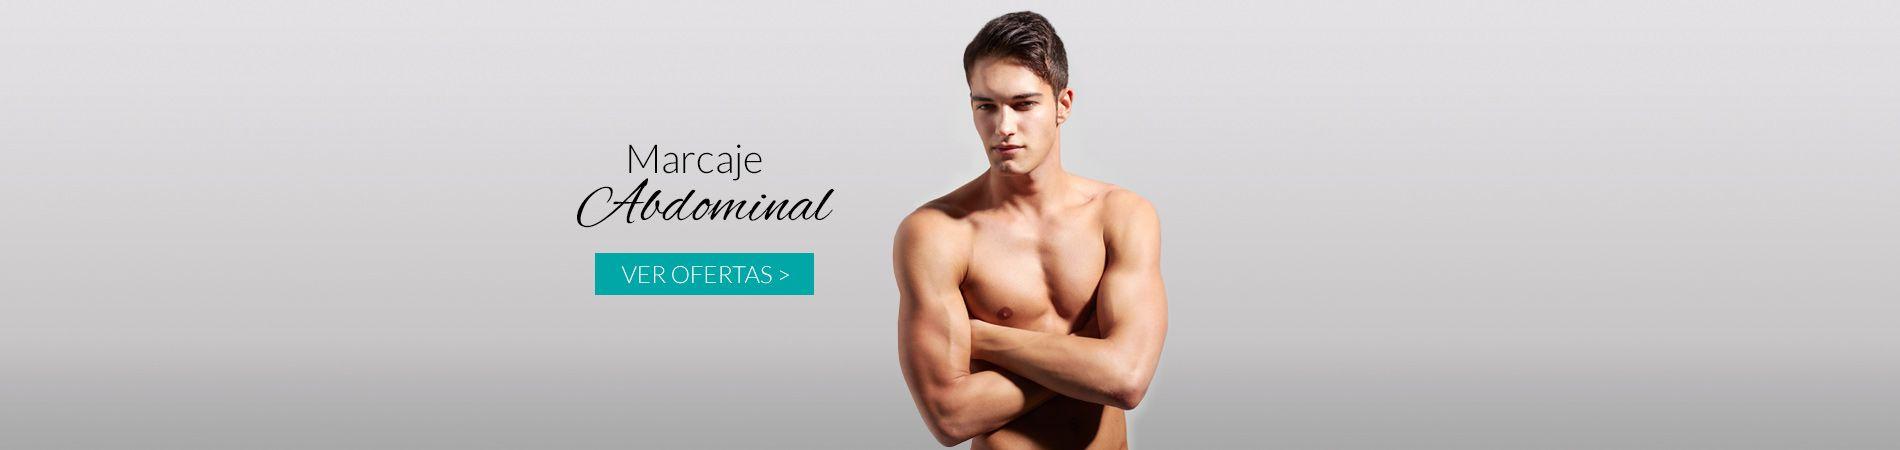 marcaje abdominal_